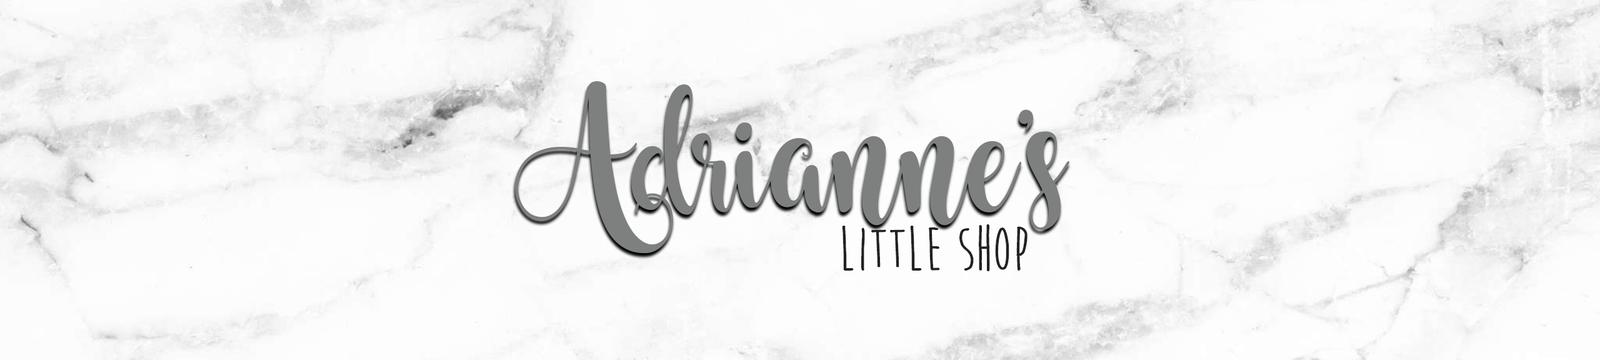 Adrianne's Little Shop